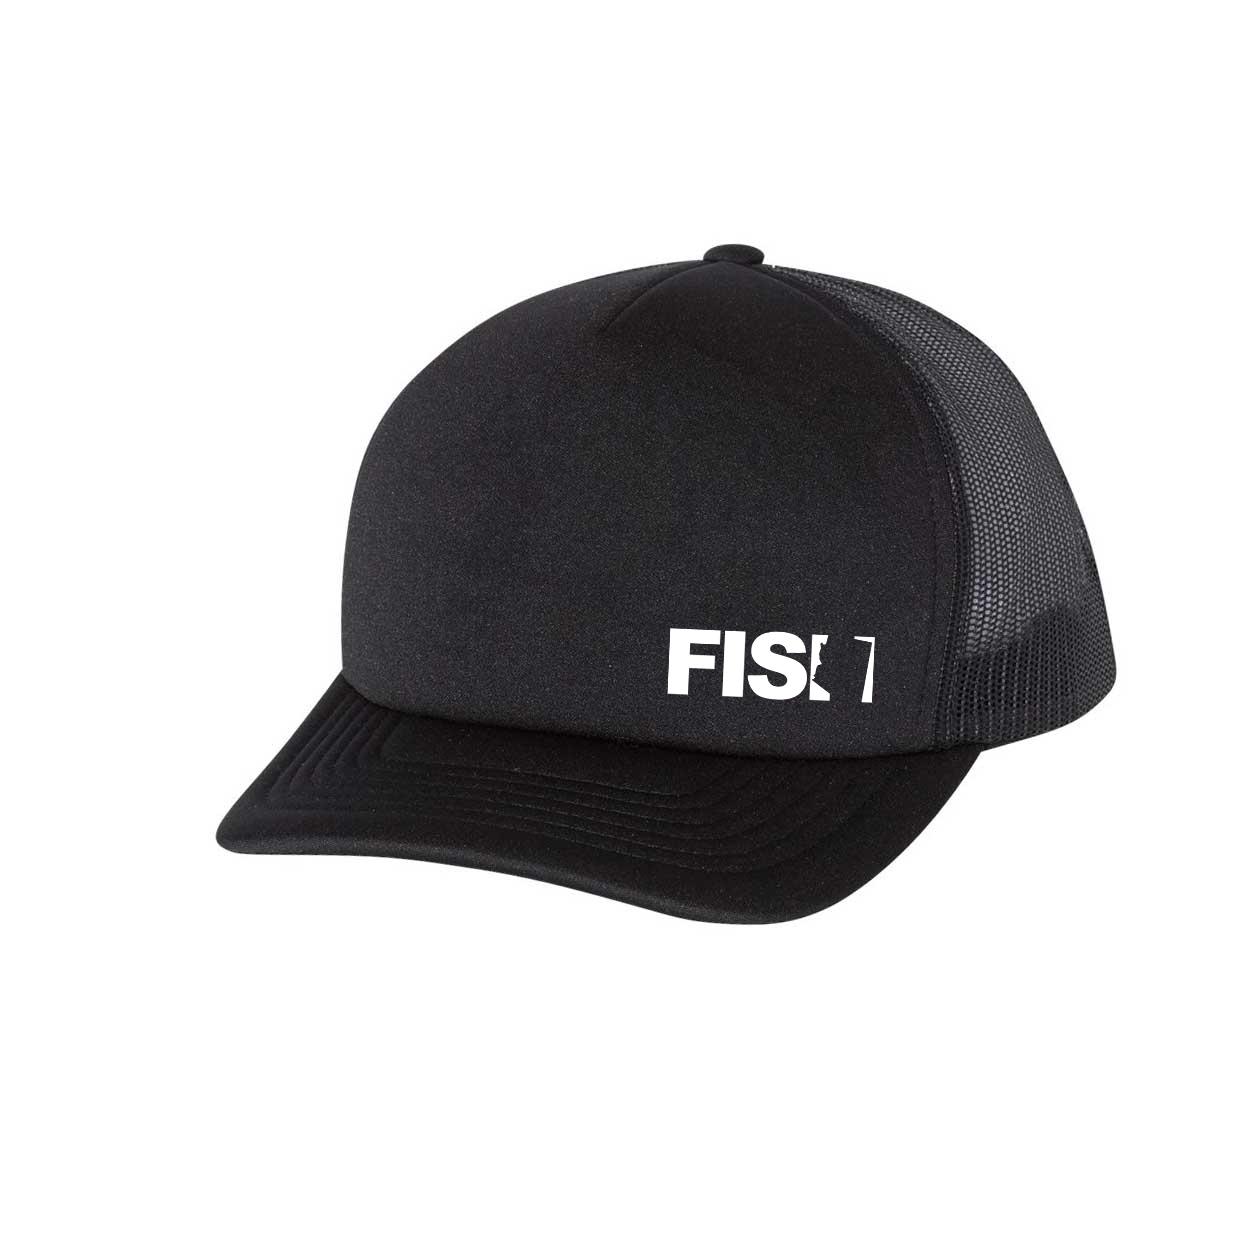 Fish Arizona Night Out Premium Foam Trucker Snapback Hat Black (White Logo)